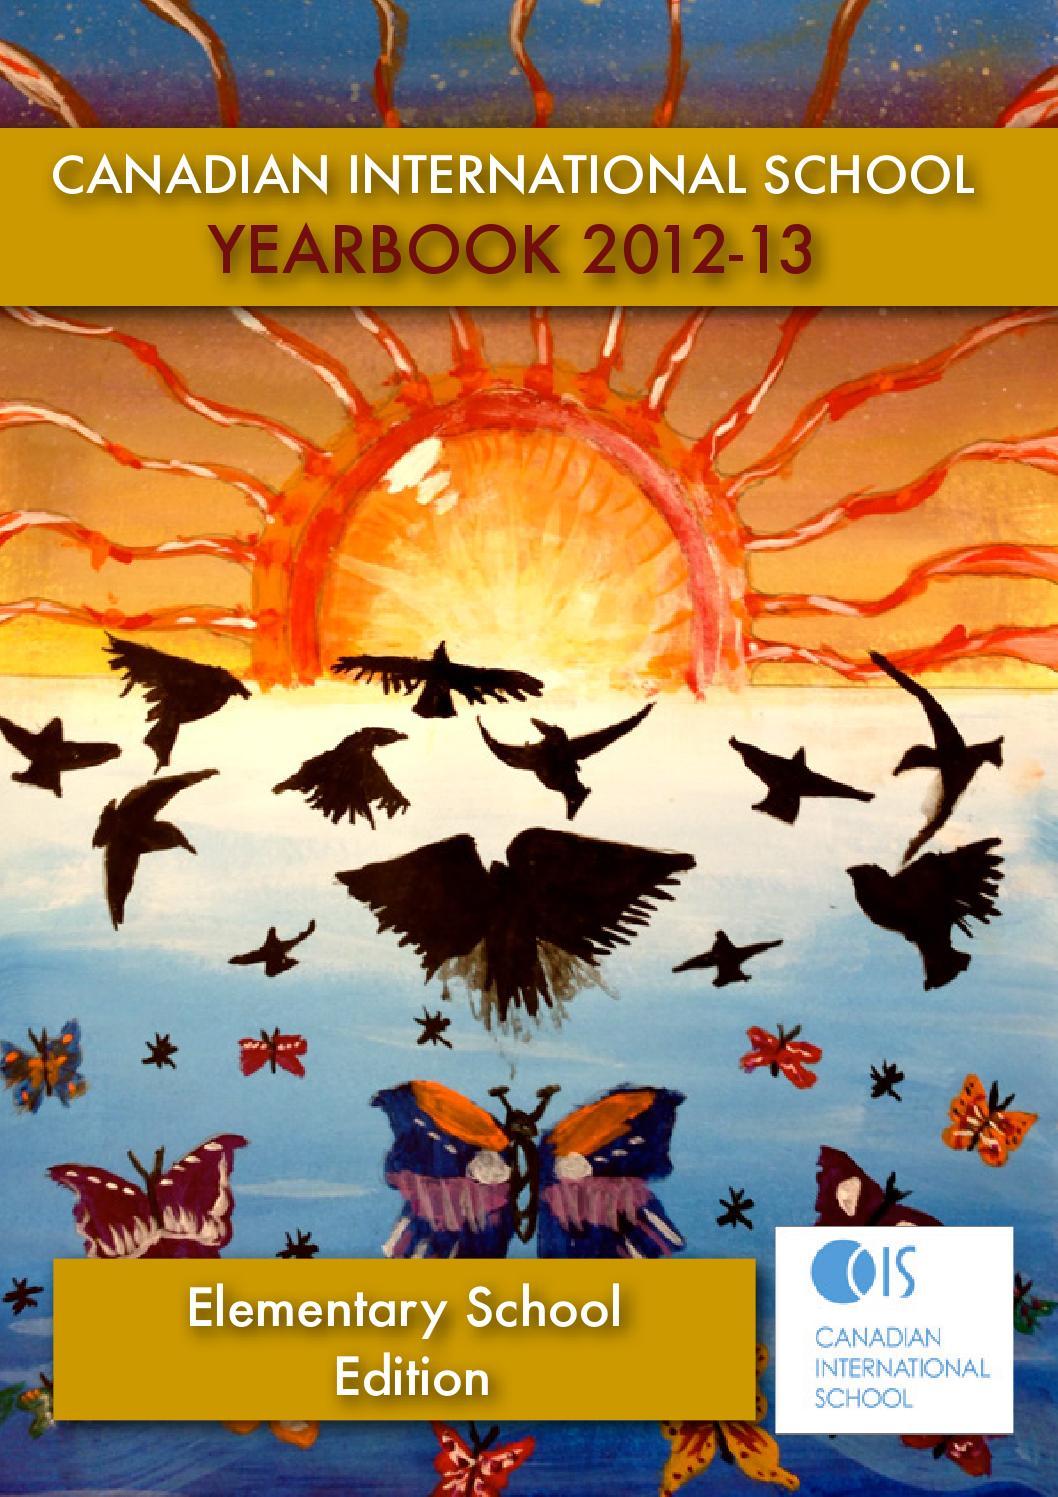 Canadian International School Yearbook 20 20 by madhukar sv   issuu